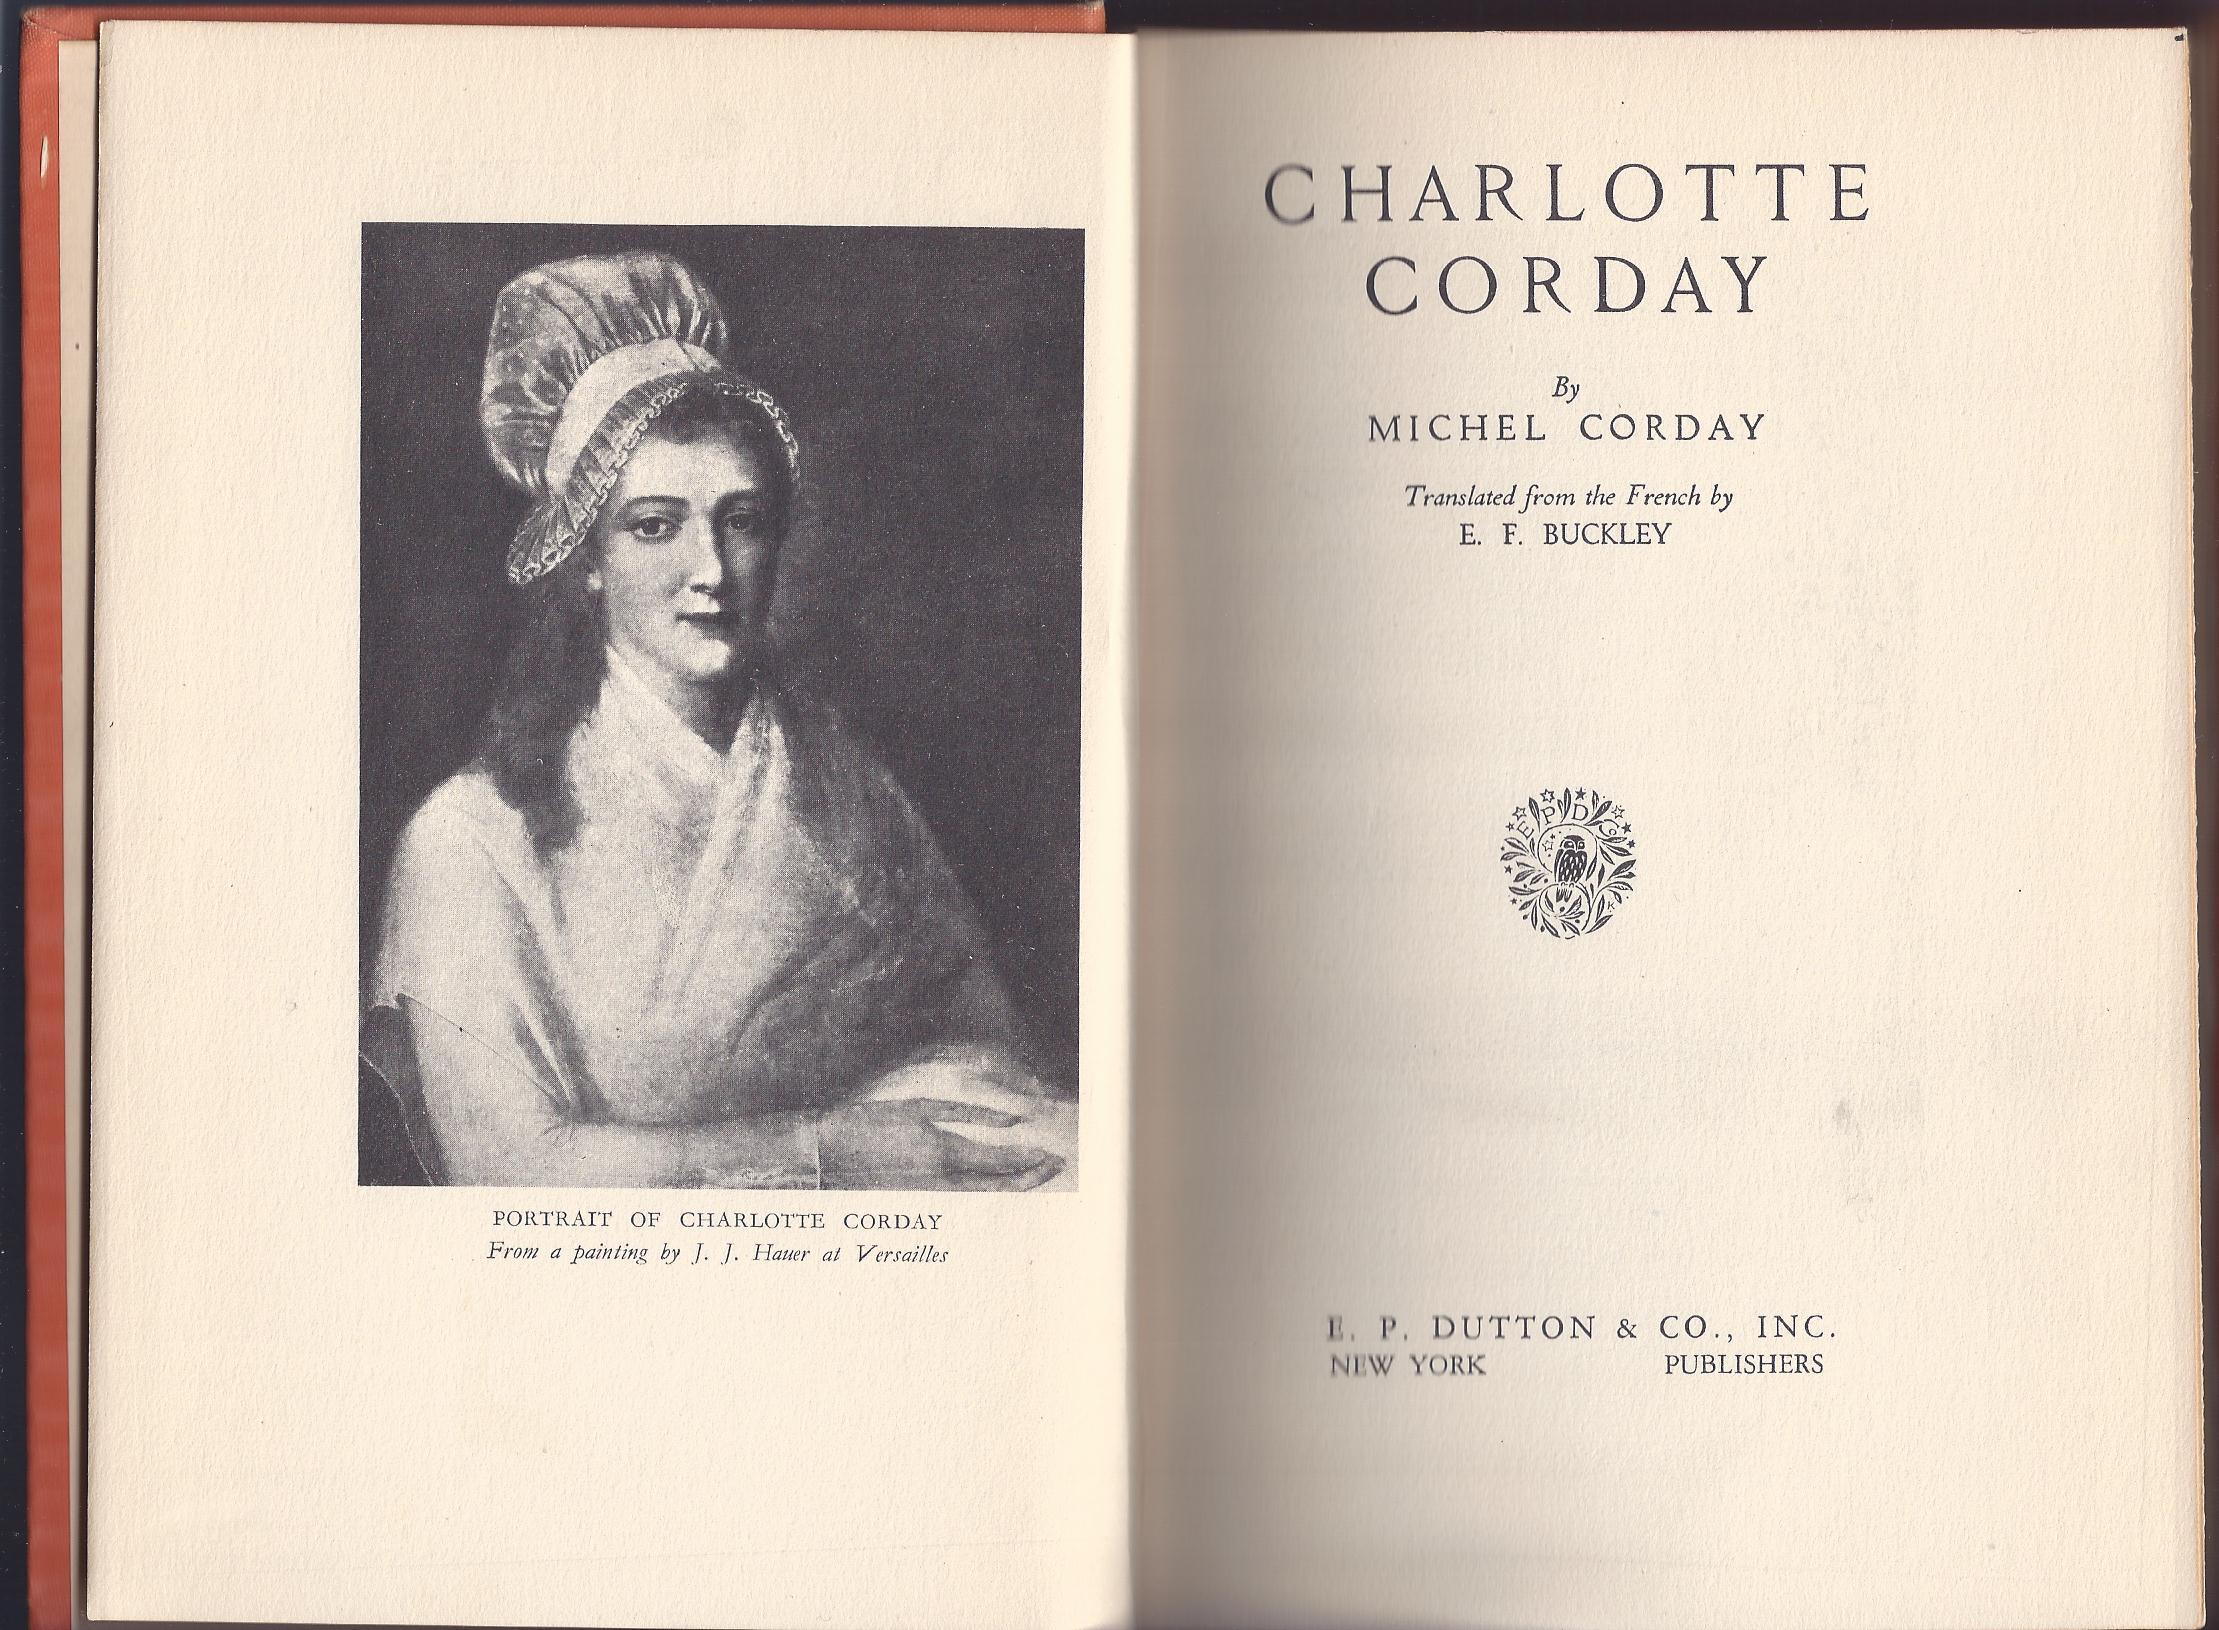 Michel Corday. Charlotte Corday